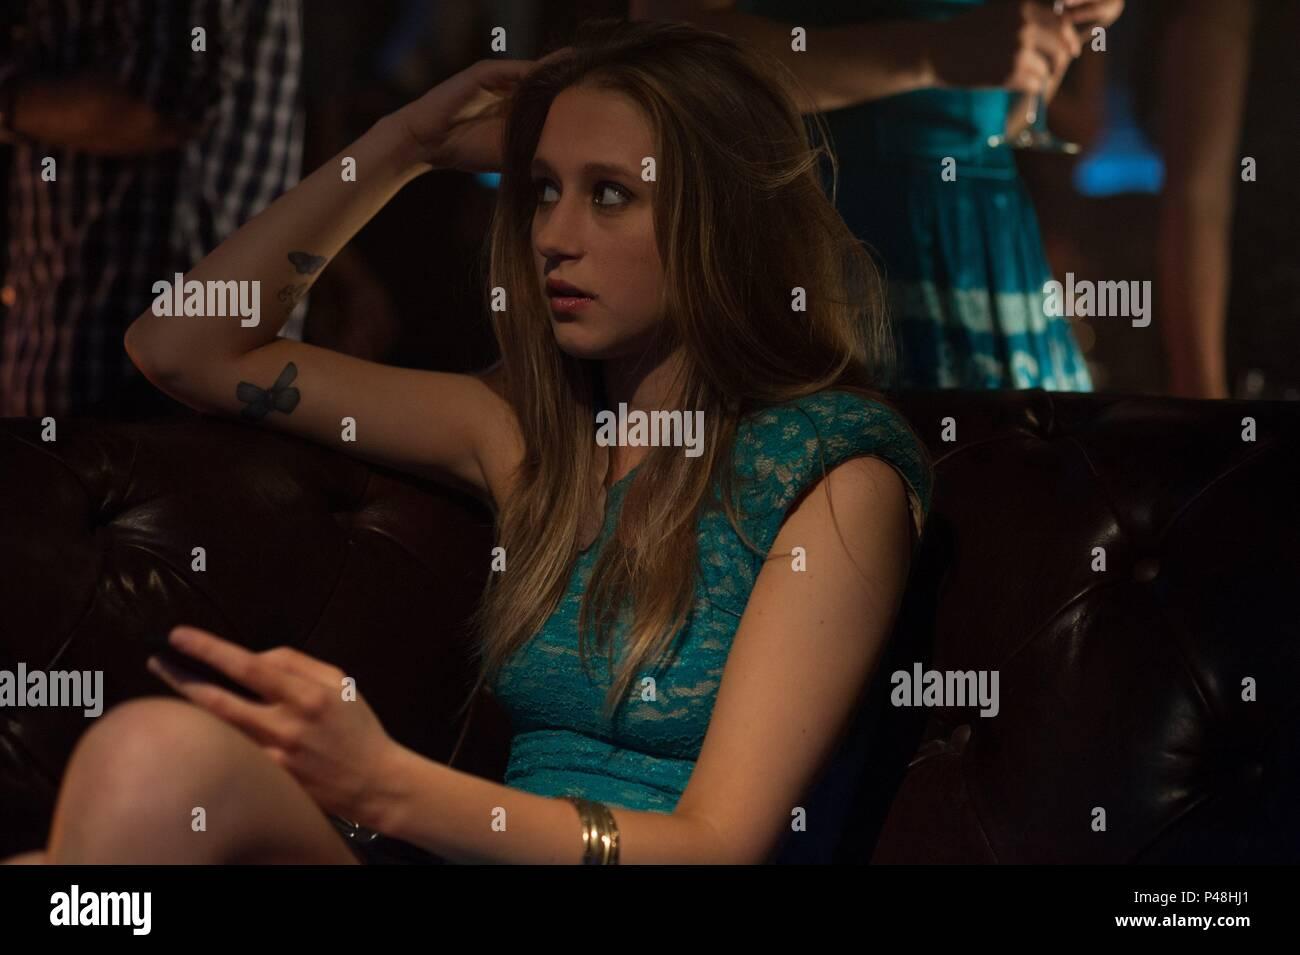 Original Film Title: THE BLING RING.  English Title: THE BLING RING.  Film Director: SOFIA COPPOLA.  Year: 2013.  Stars: TAISSA FARMIGA. Credit: AMERICAN ZOETROPE / Album - Stock Image